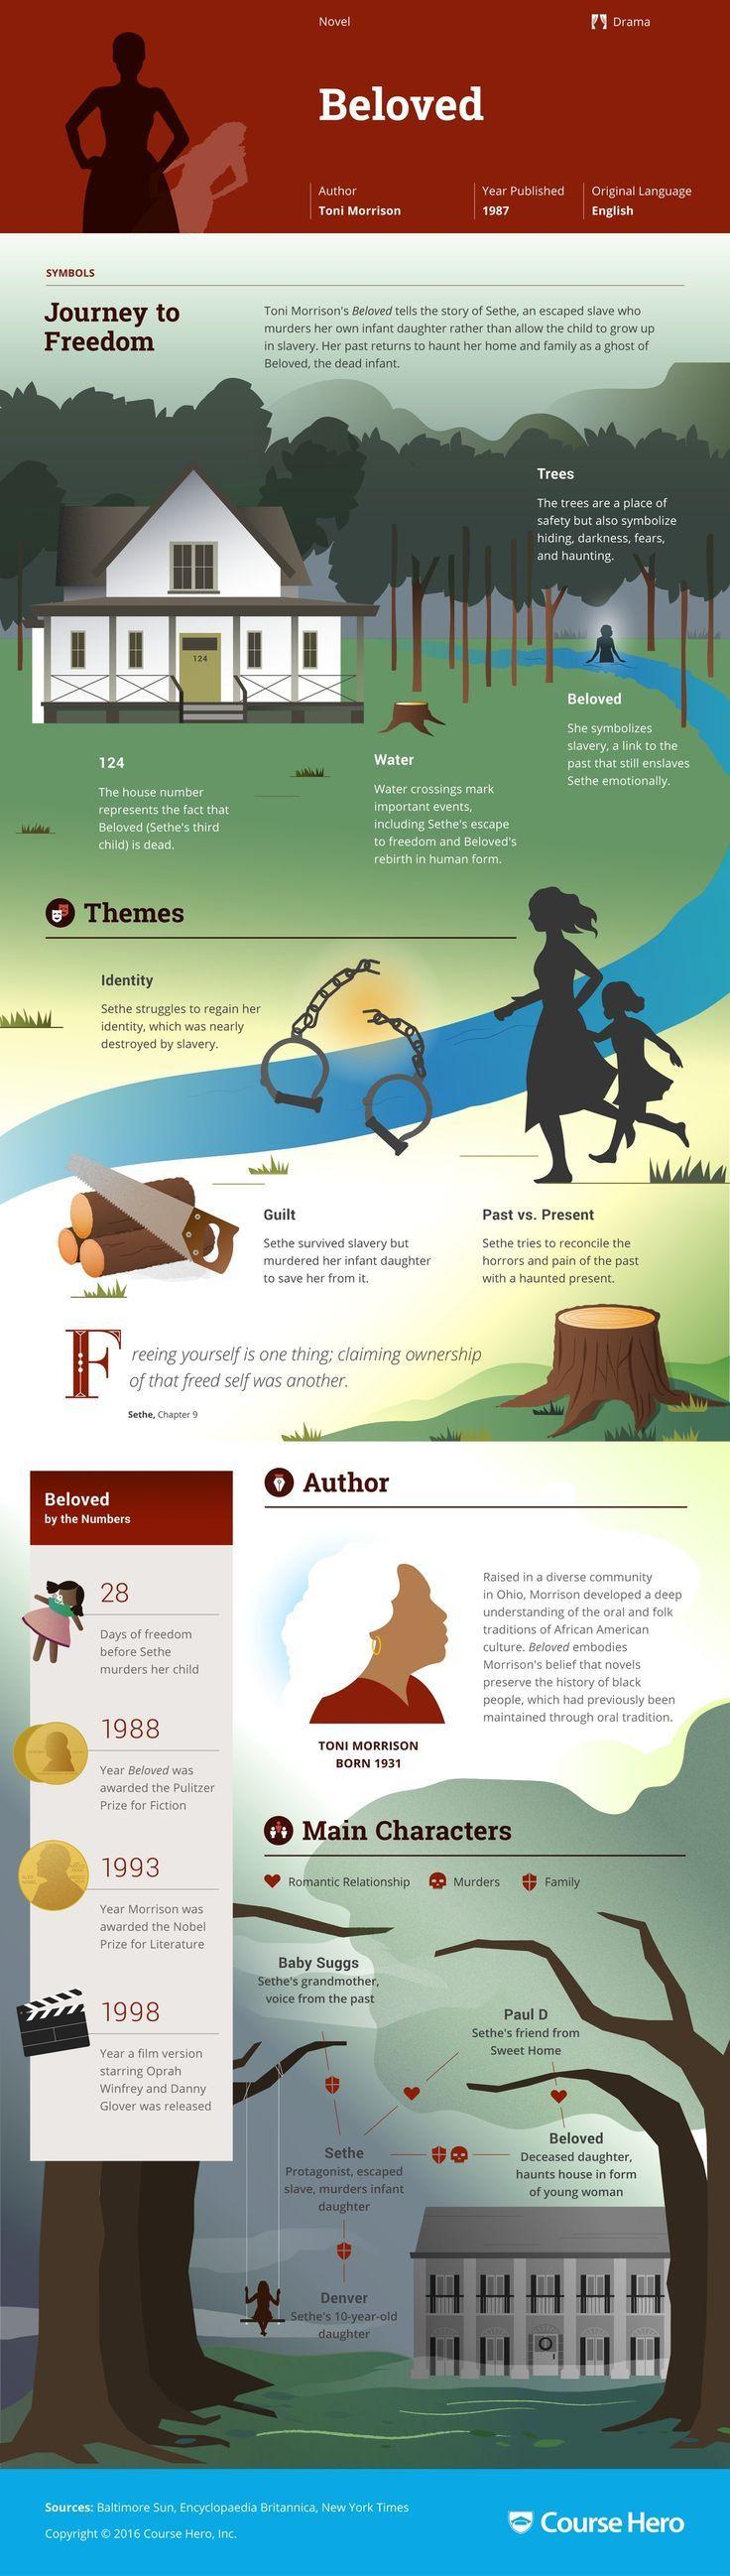 Beloved Infographic